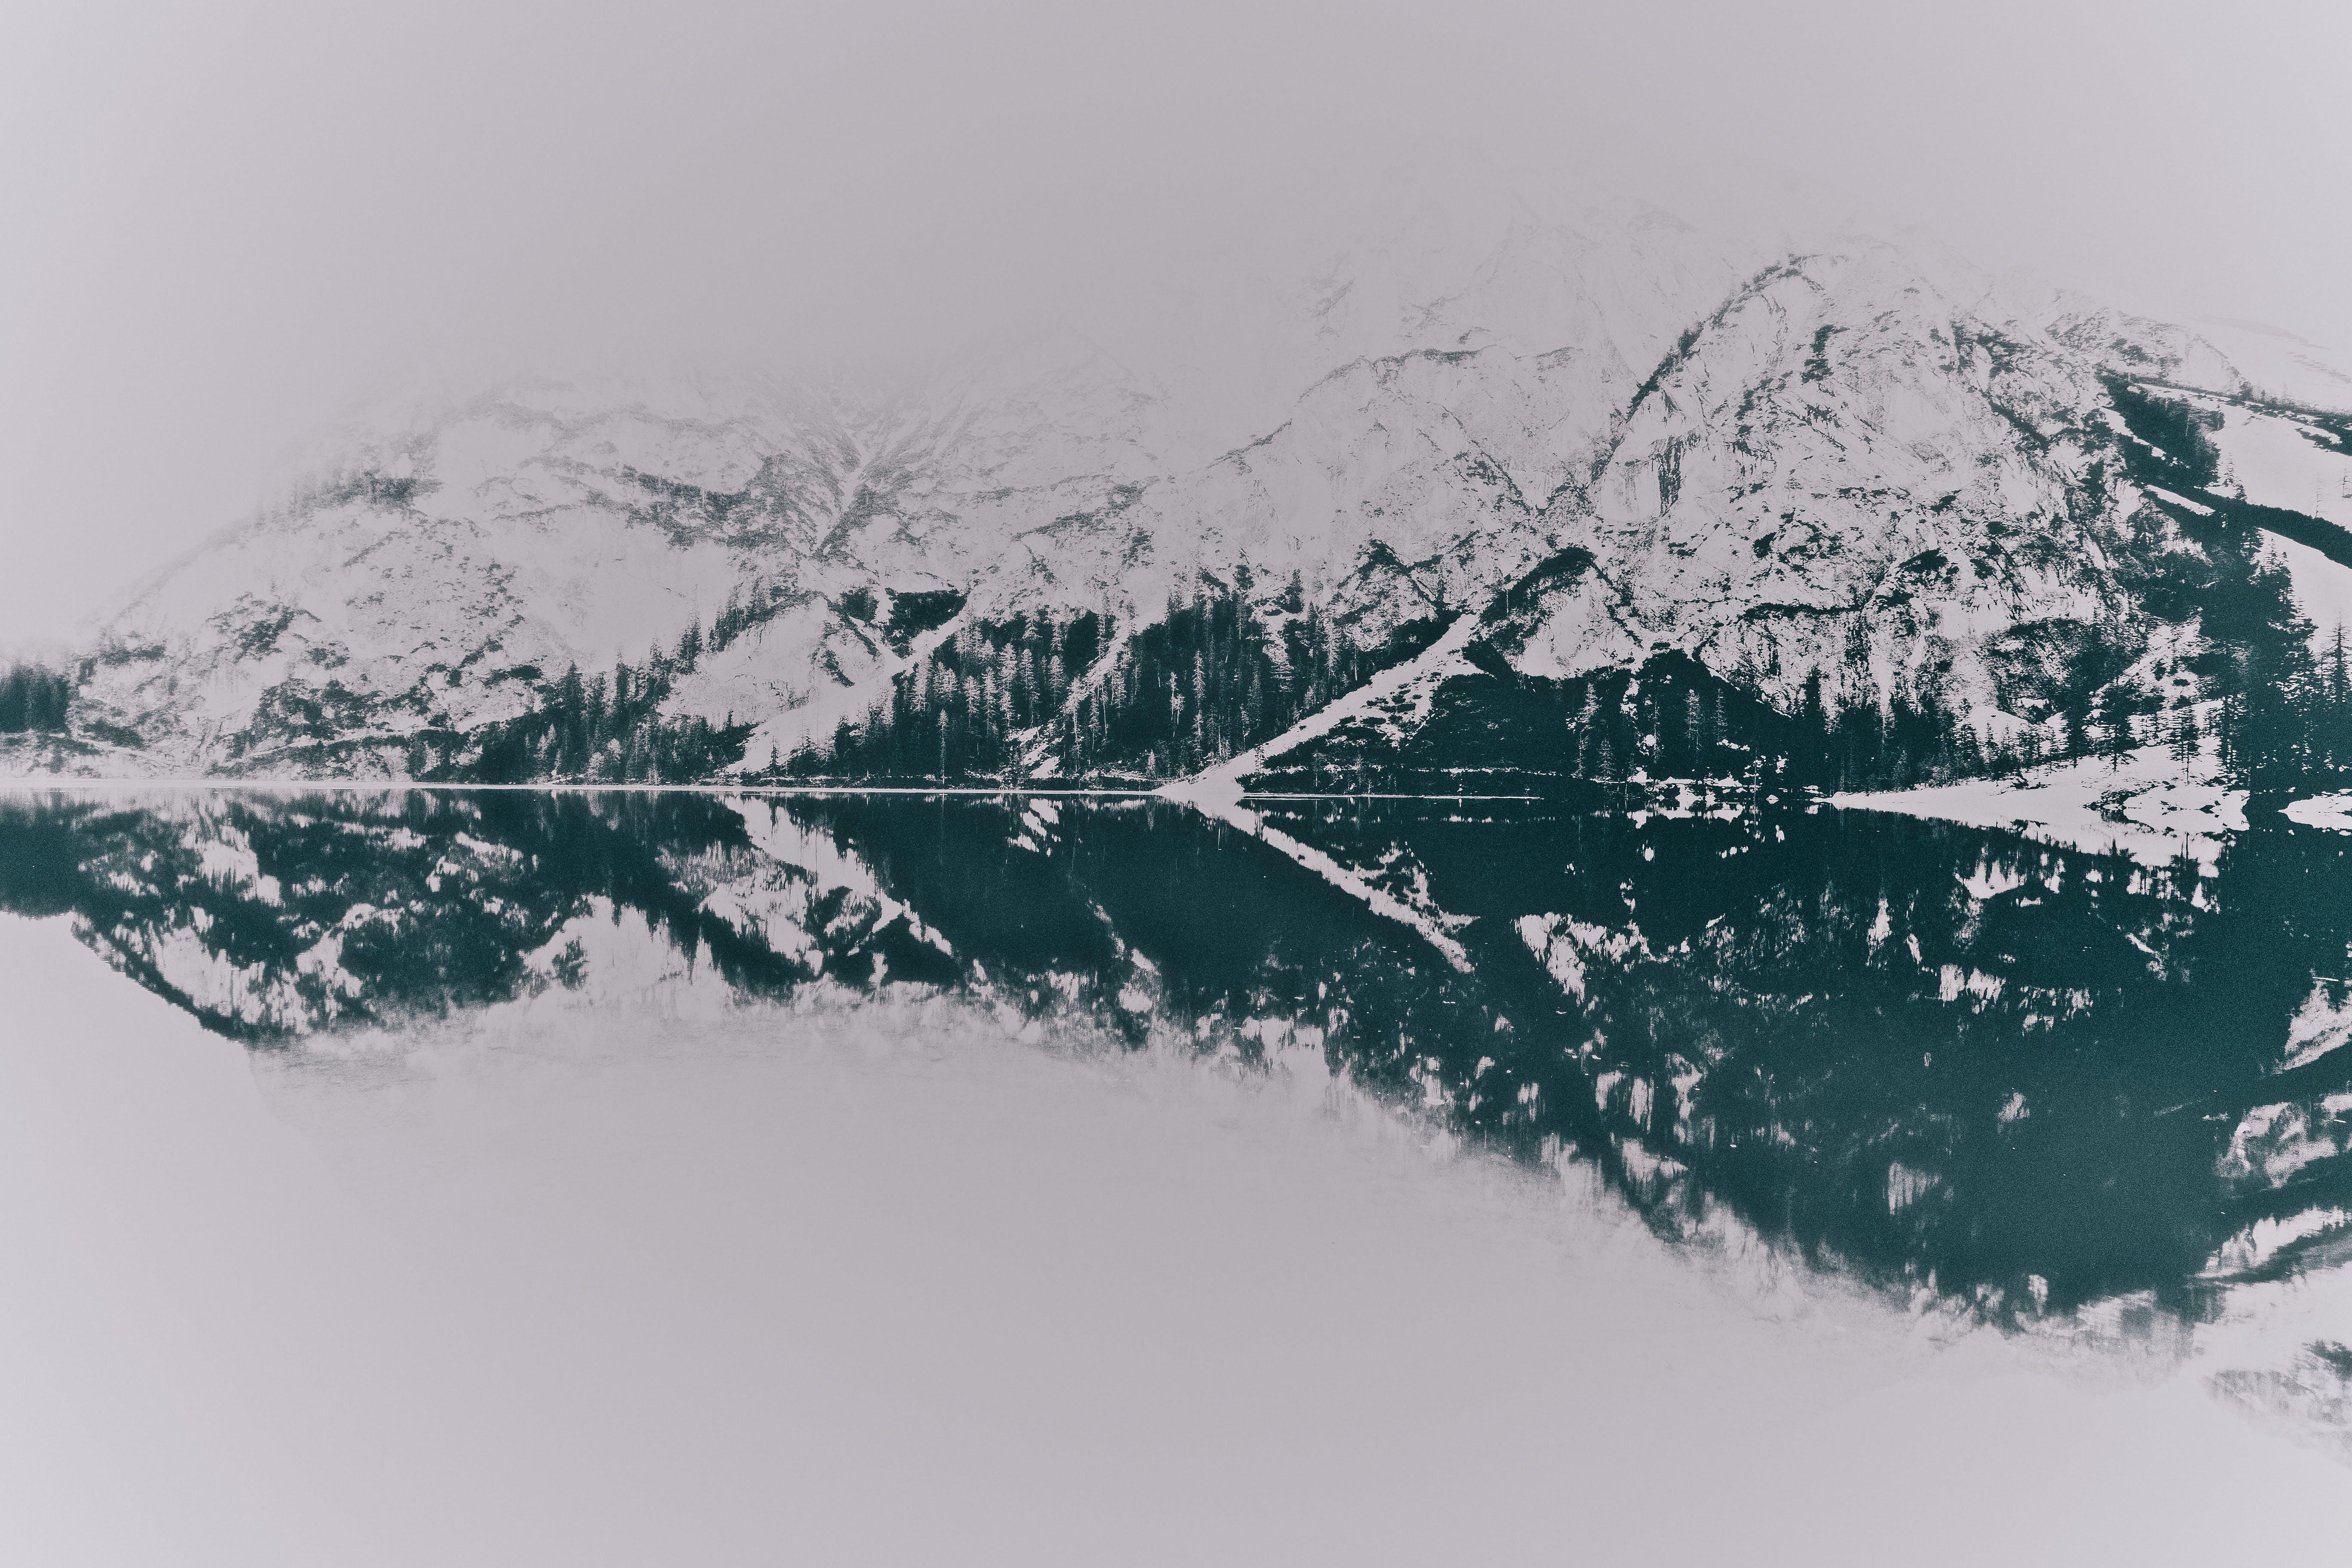 Landscape Photo of Snowy Mountains Near Lake